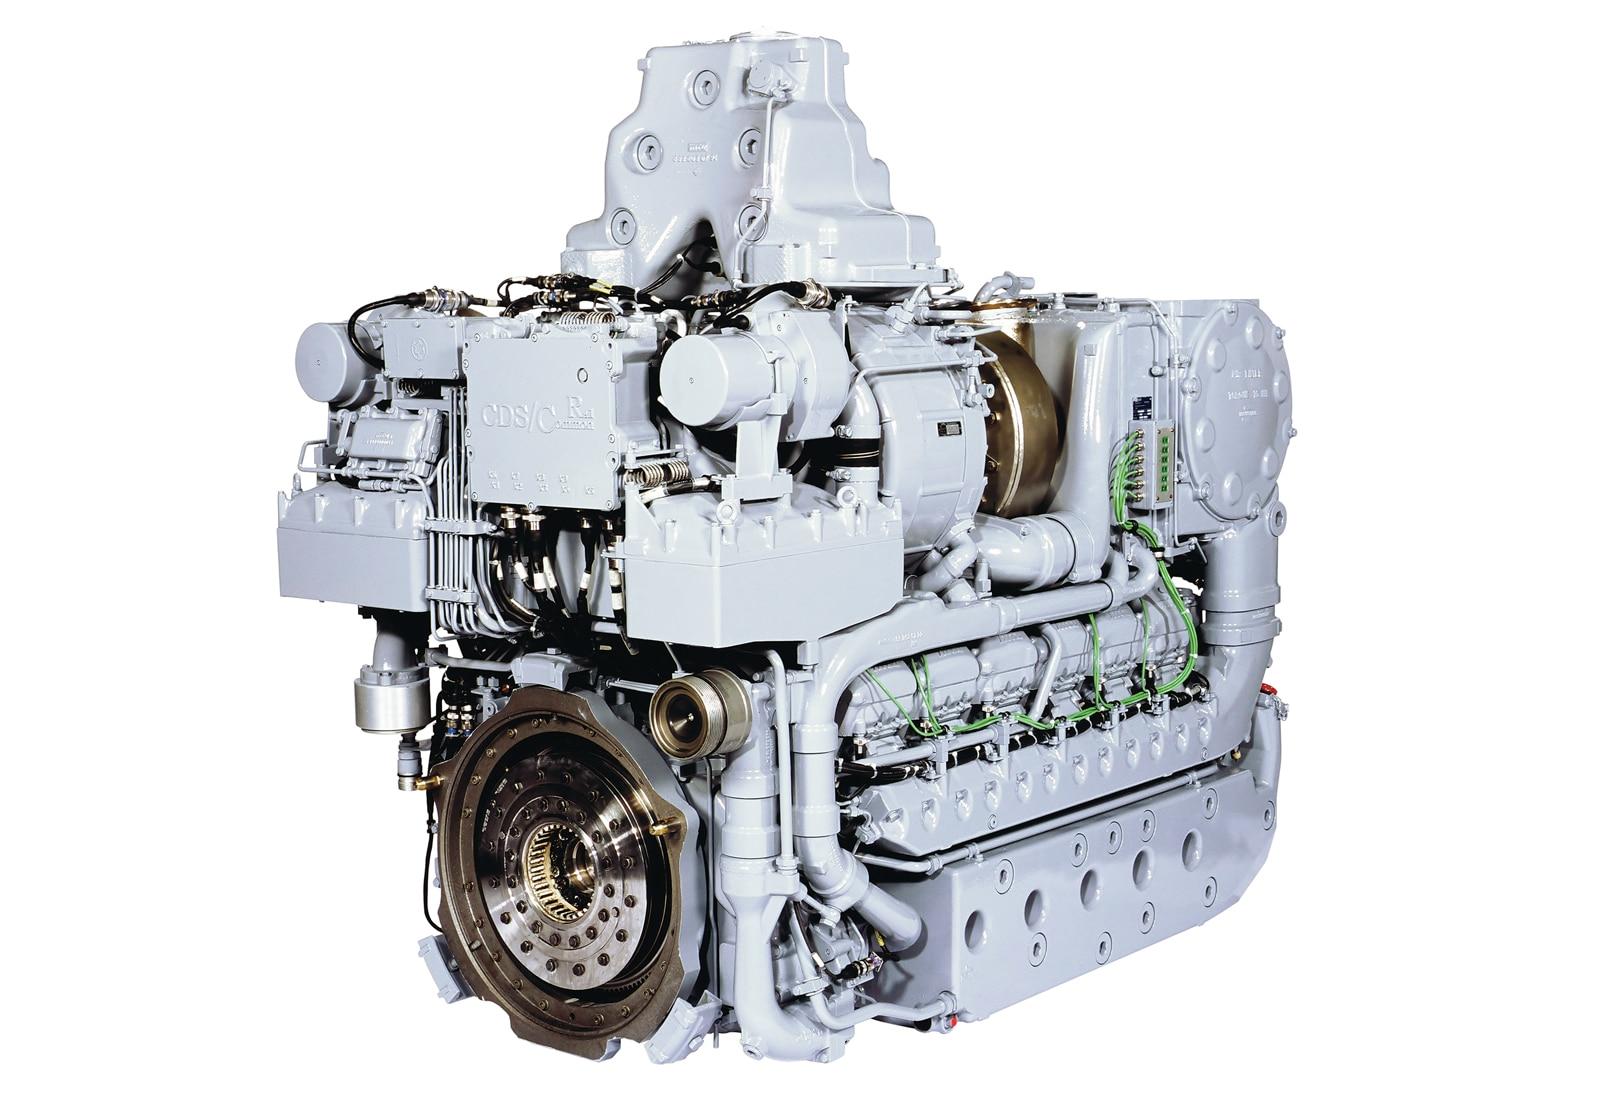 Expeditionary Fighting Vehicle - MTU MT883 Diesel Engine